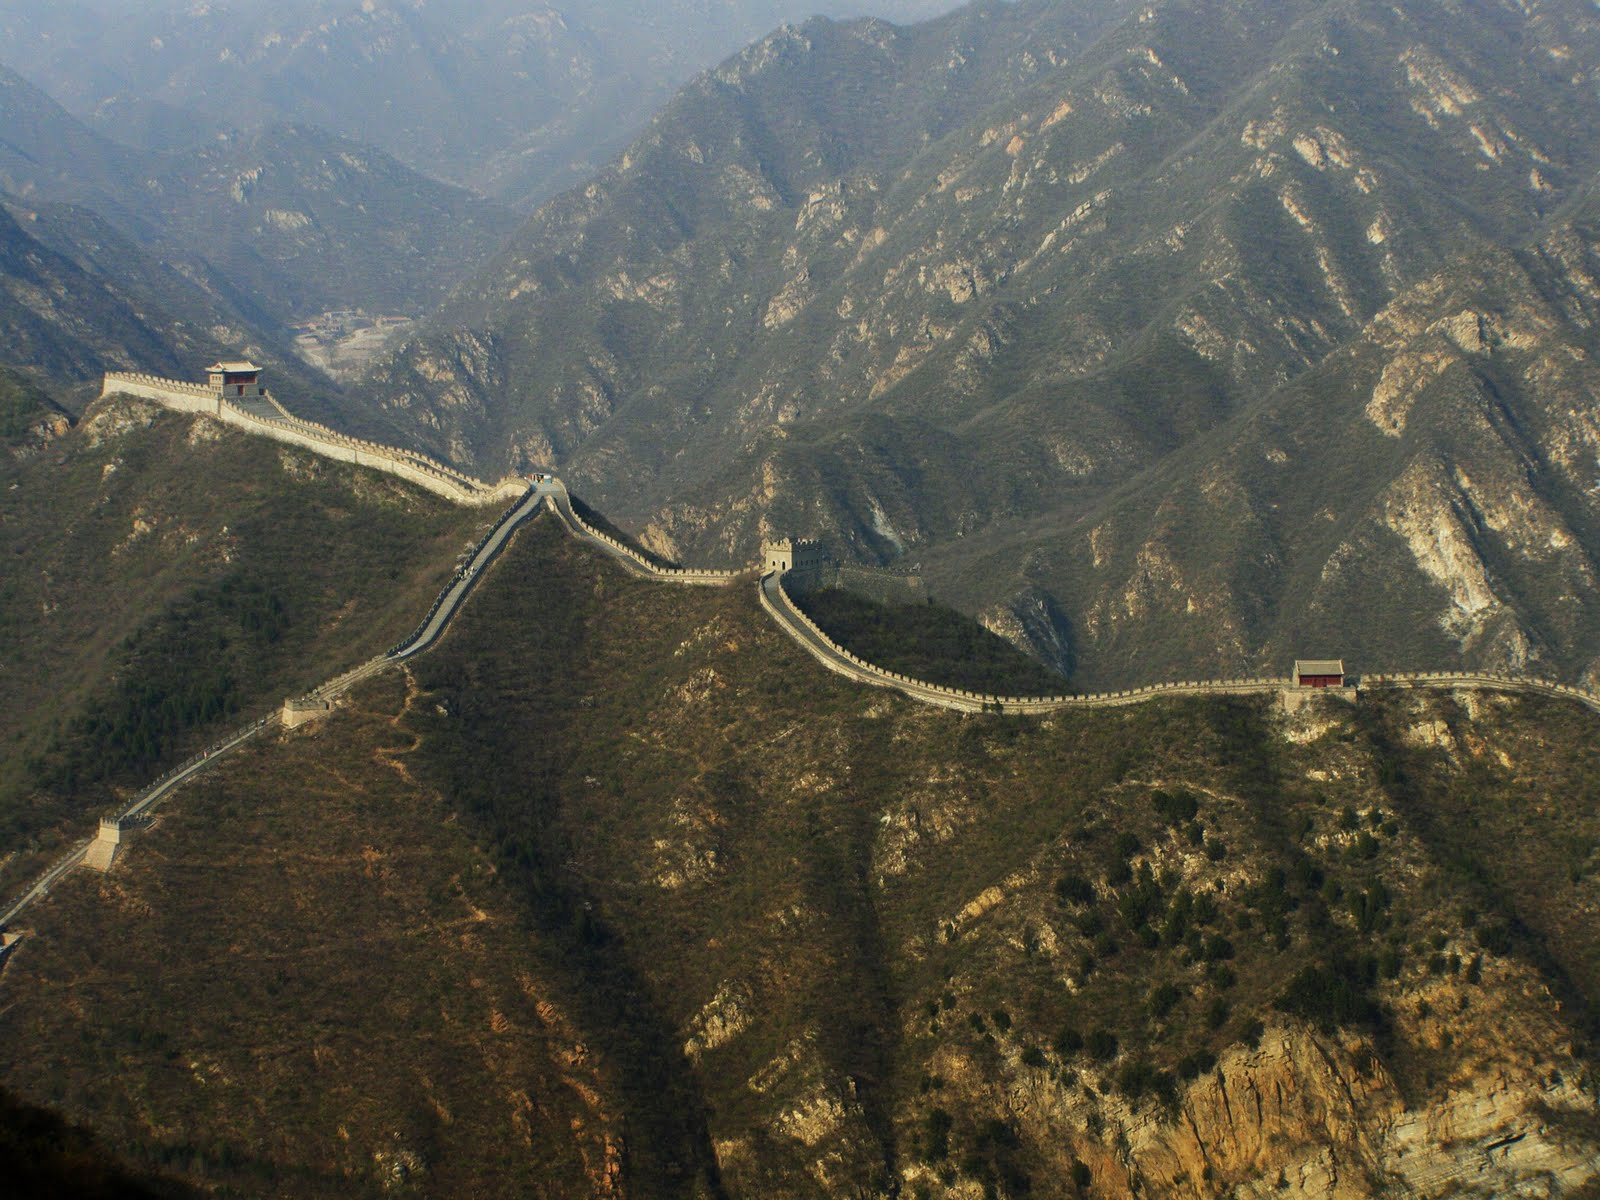 Wall of china view wallpaper 1600x1200 15201 1600x1200